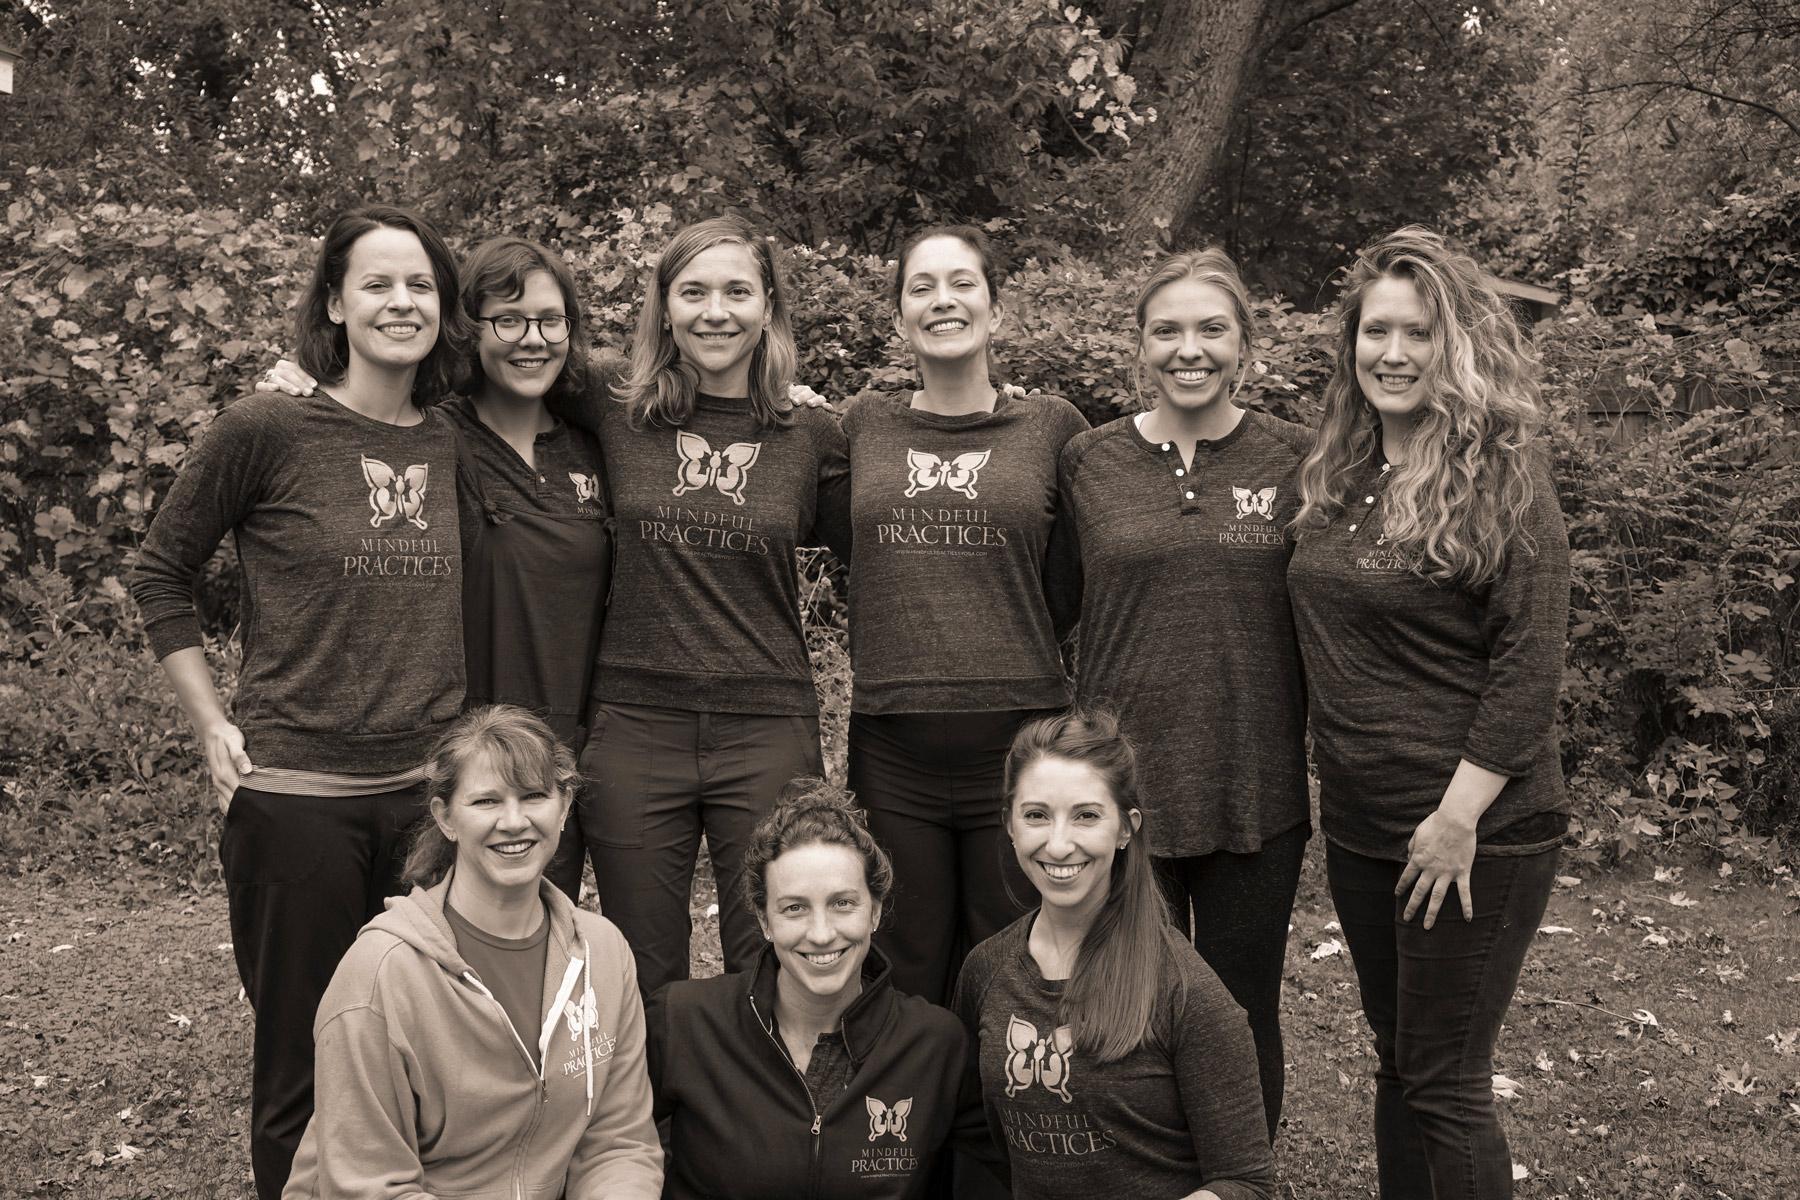 Mindful-Practices-Leadership-Team-DSC02130-Edit